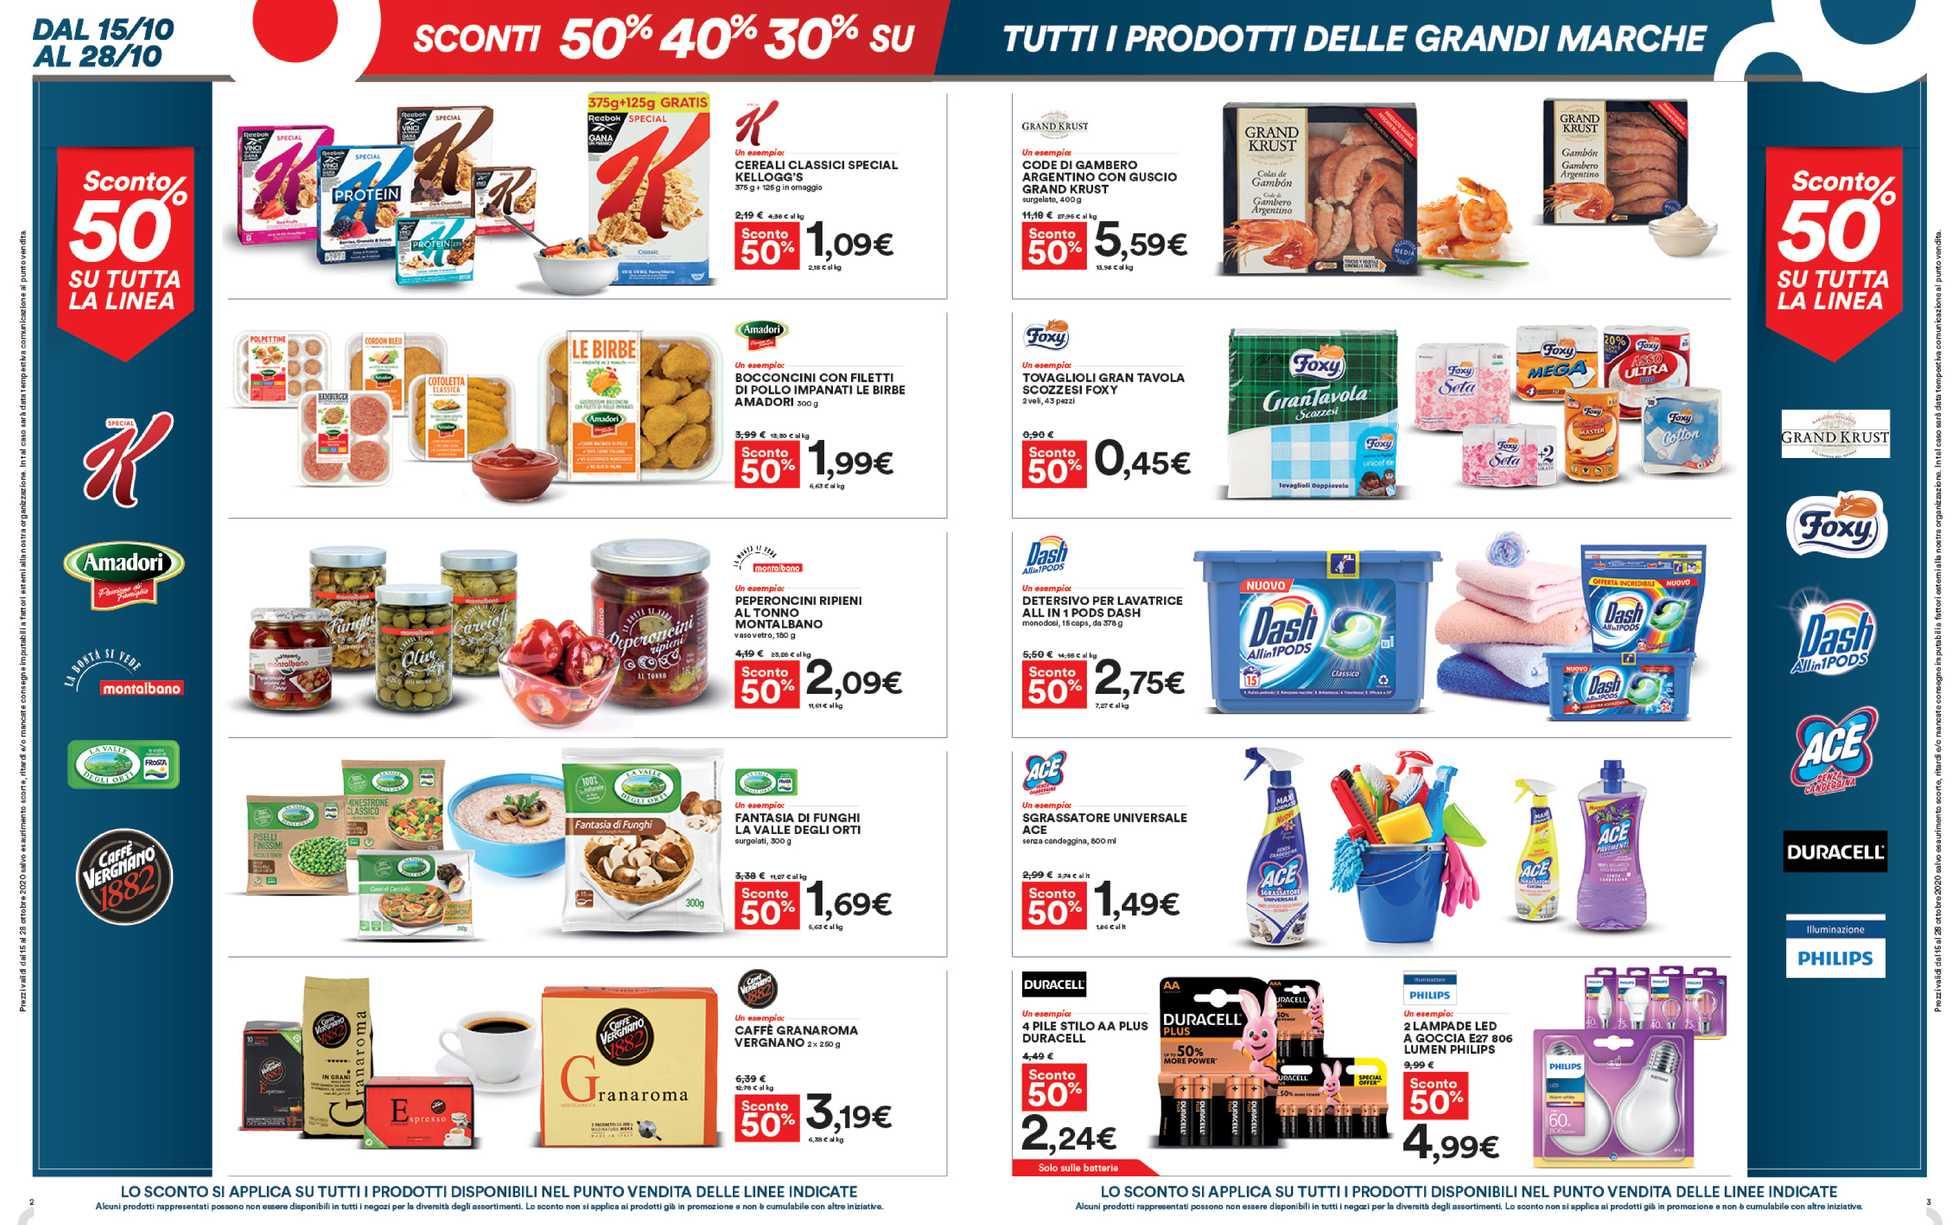 Ipercoop Lombardia - offerte valide dal 15.10.2020 al 28.10.2020 - pagina 2.